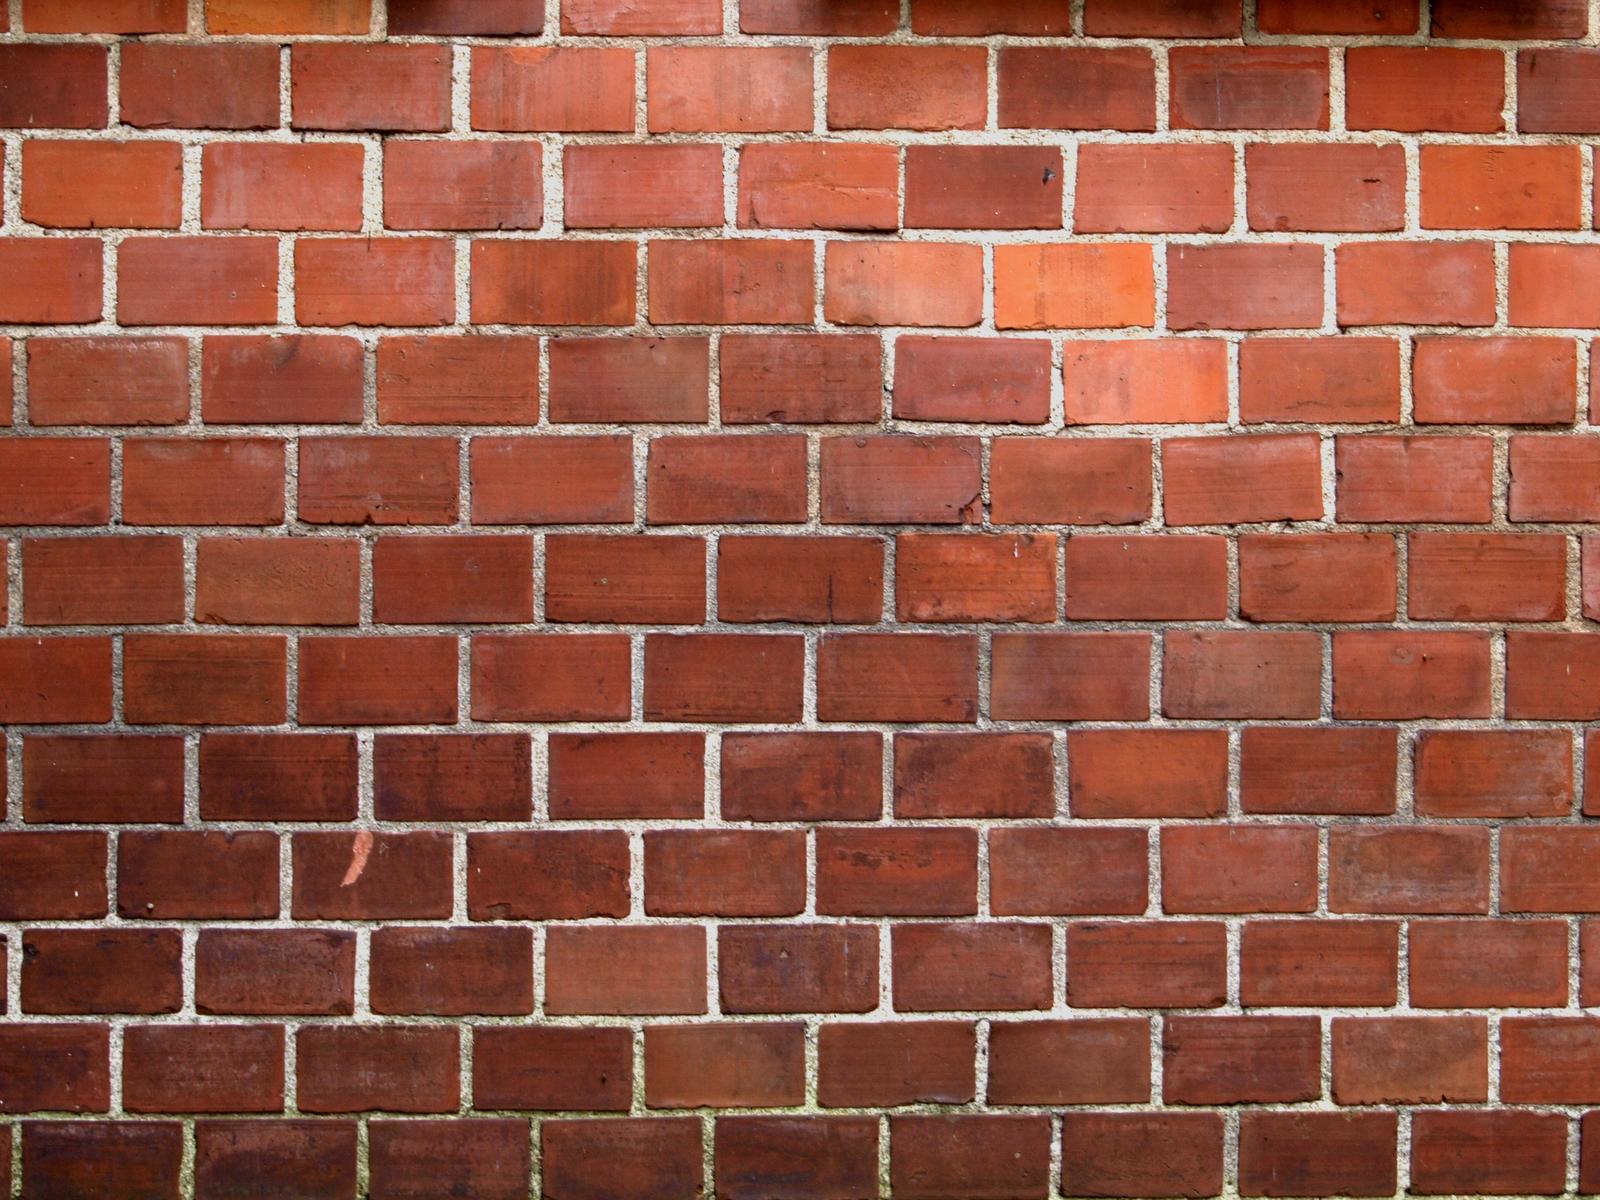 Reusage Blug Old Red Brick Wall Texture 3 Png 1 600 1 200 Pixels